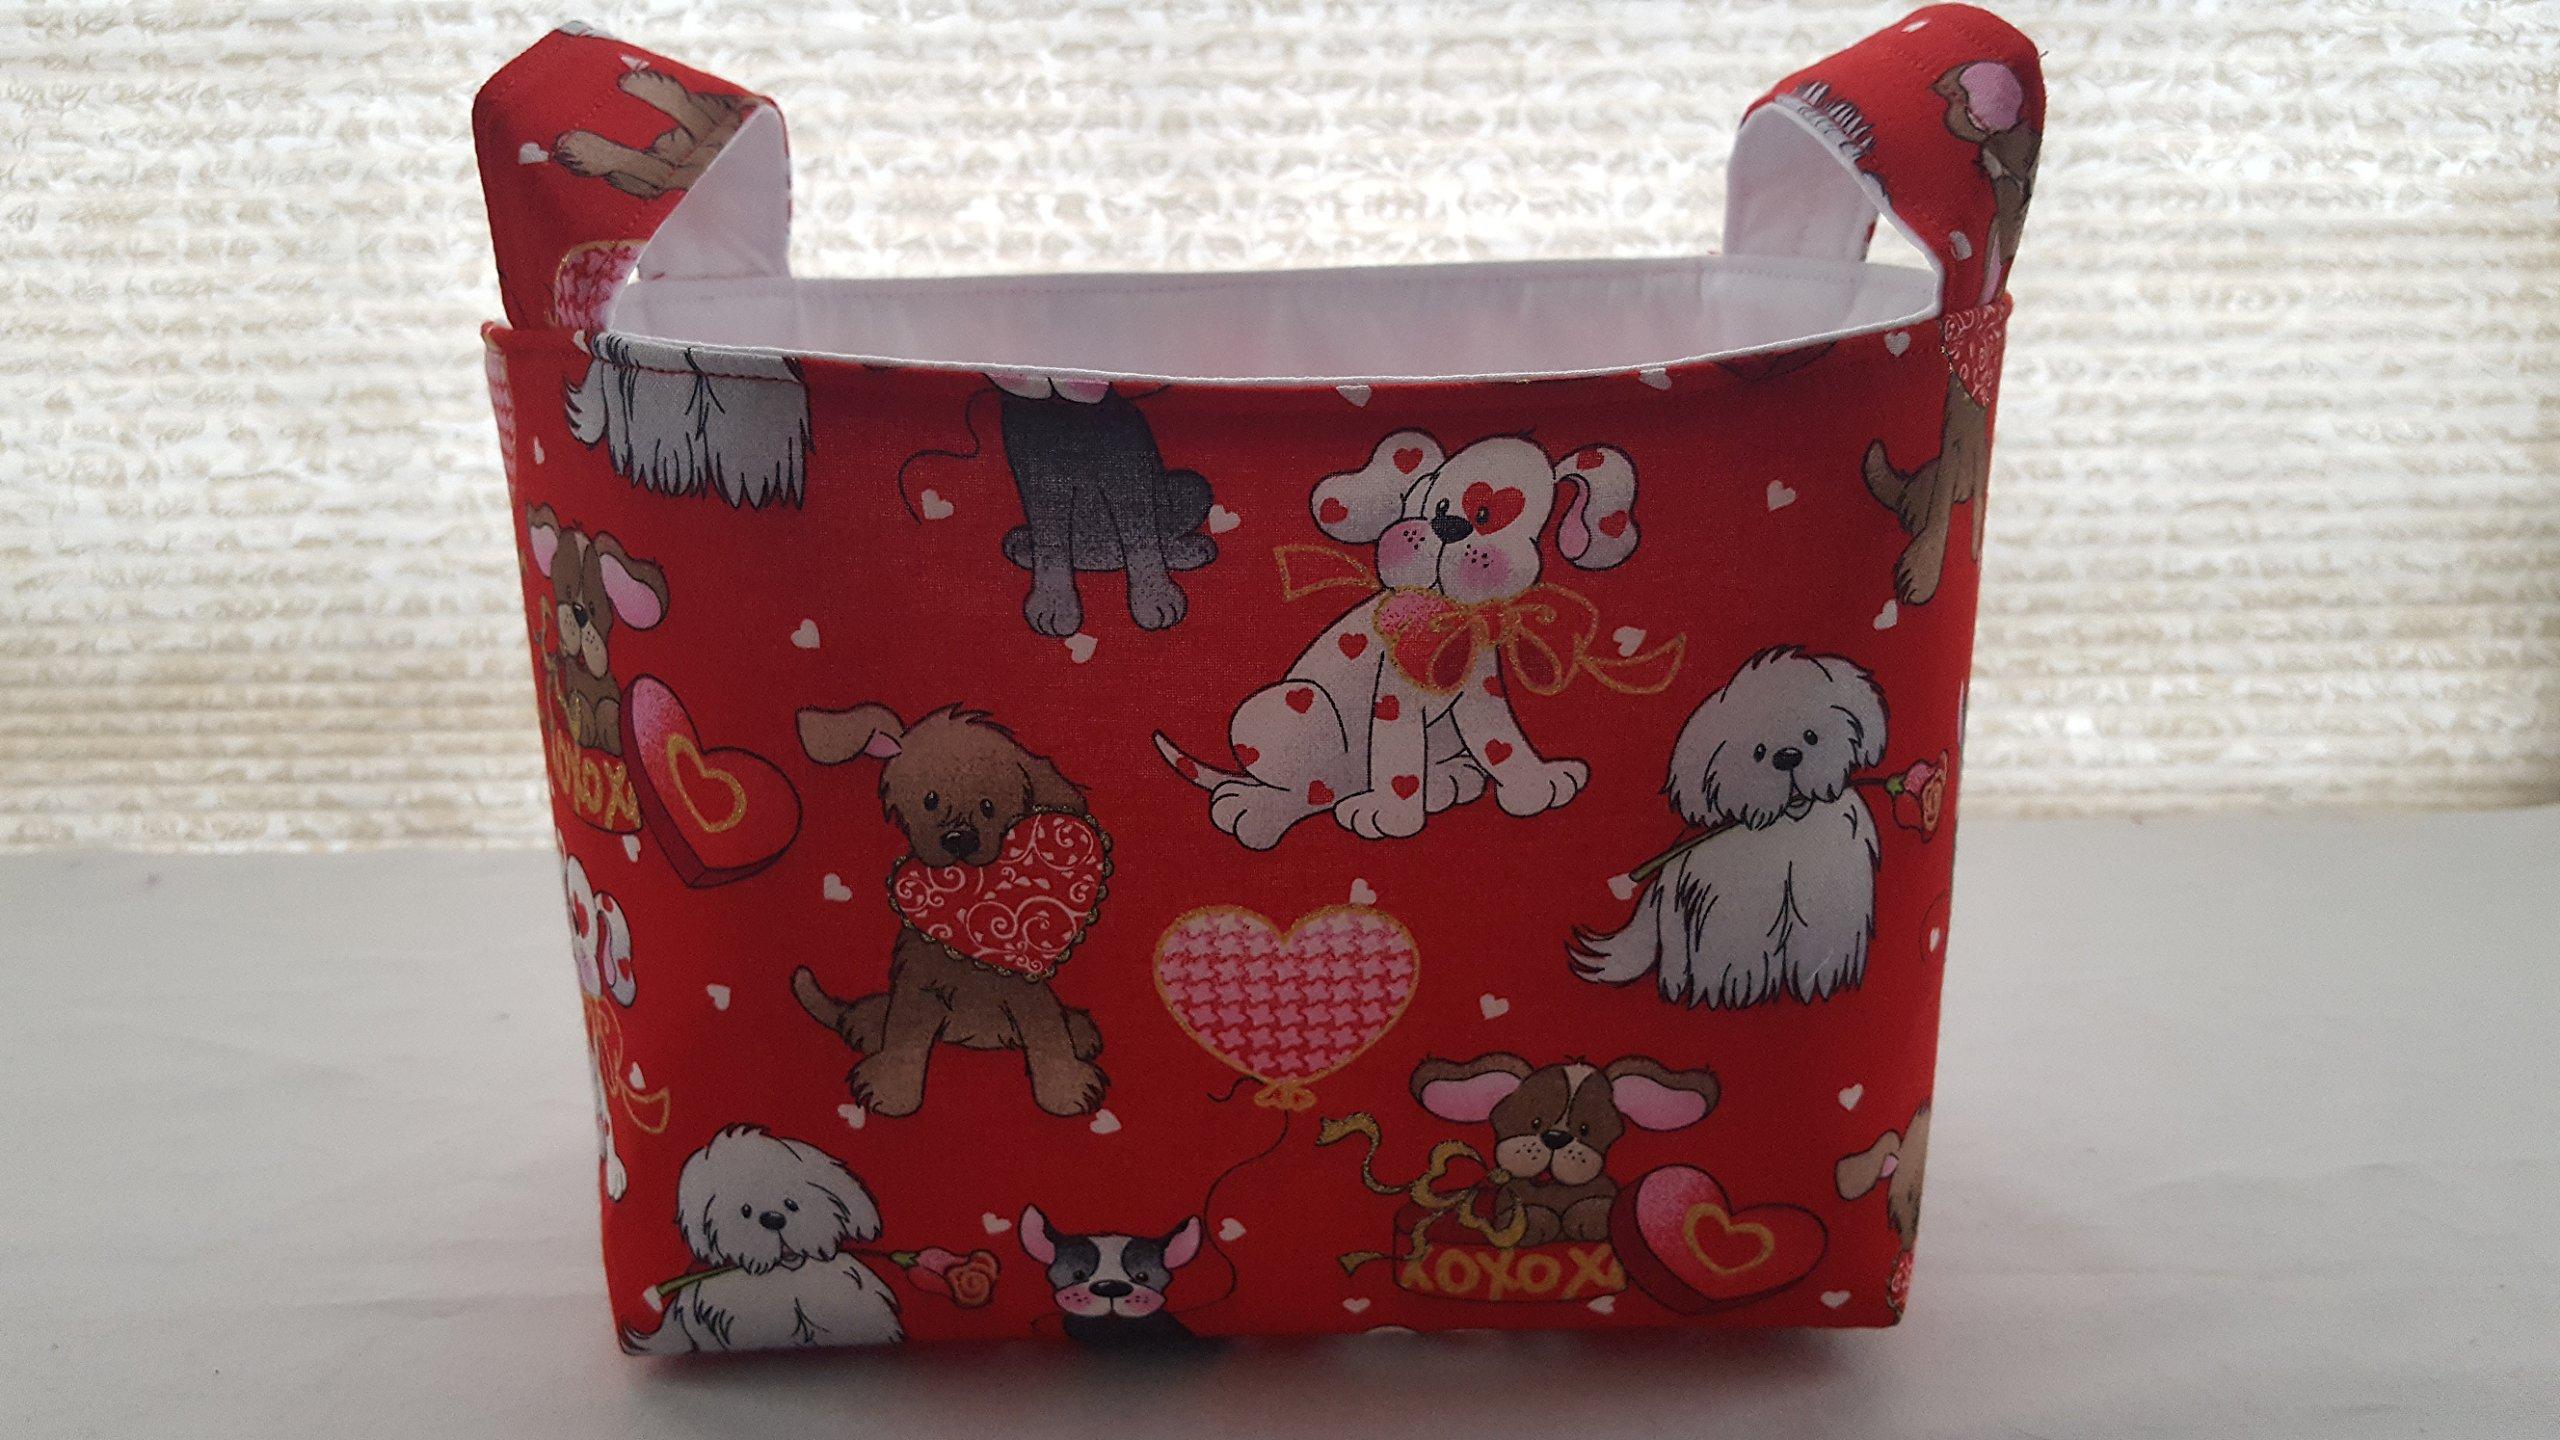 Valentine's Day Fabric Organizer Basket Bin Caddy Storage Container - Valentine Dogs Love and Kisses